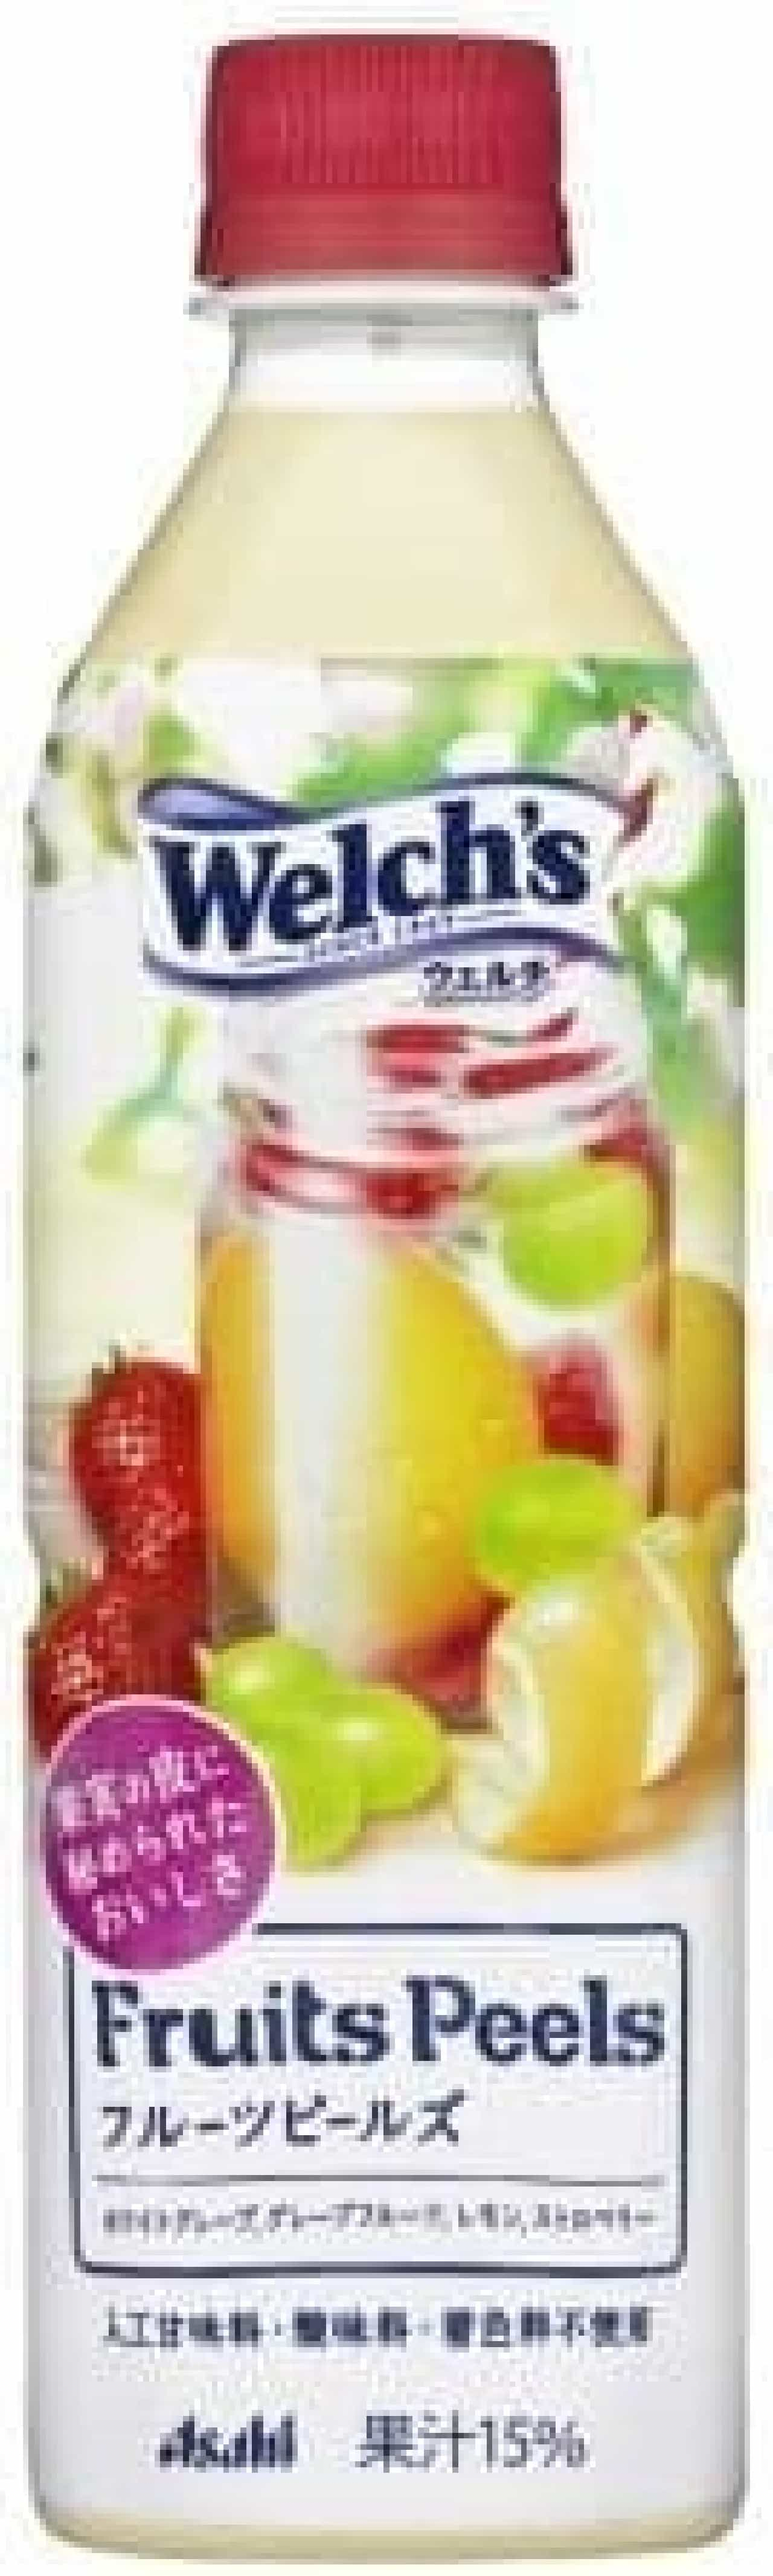 Welch's フルーツピールズ